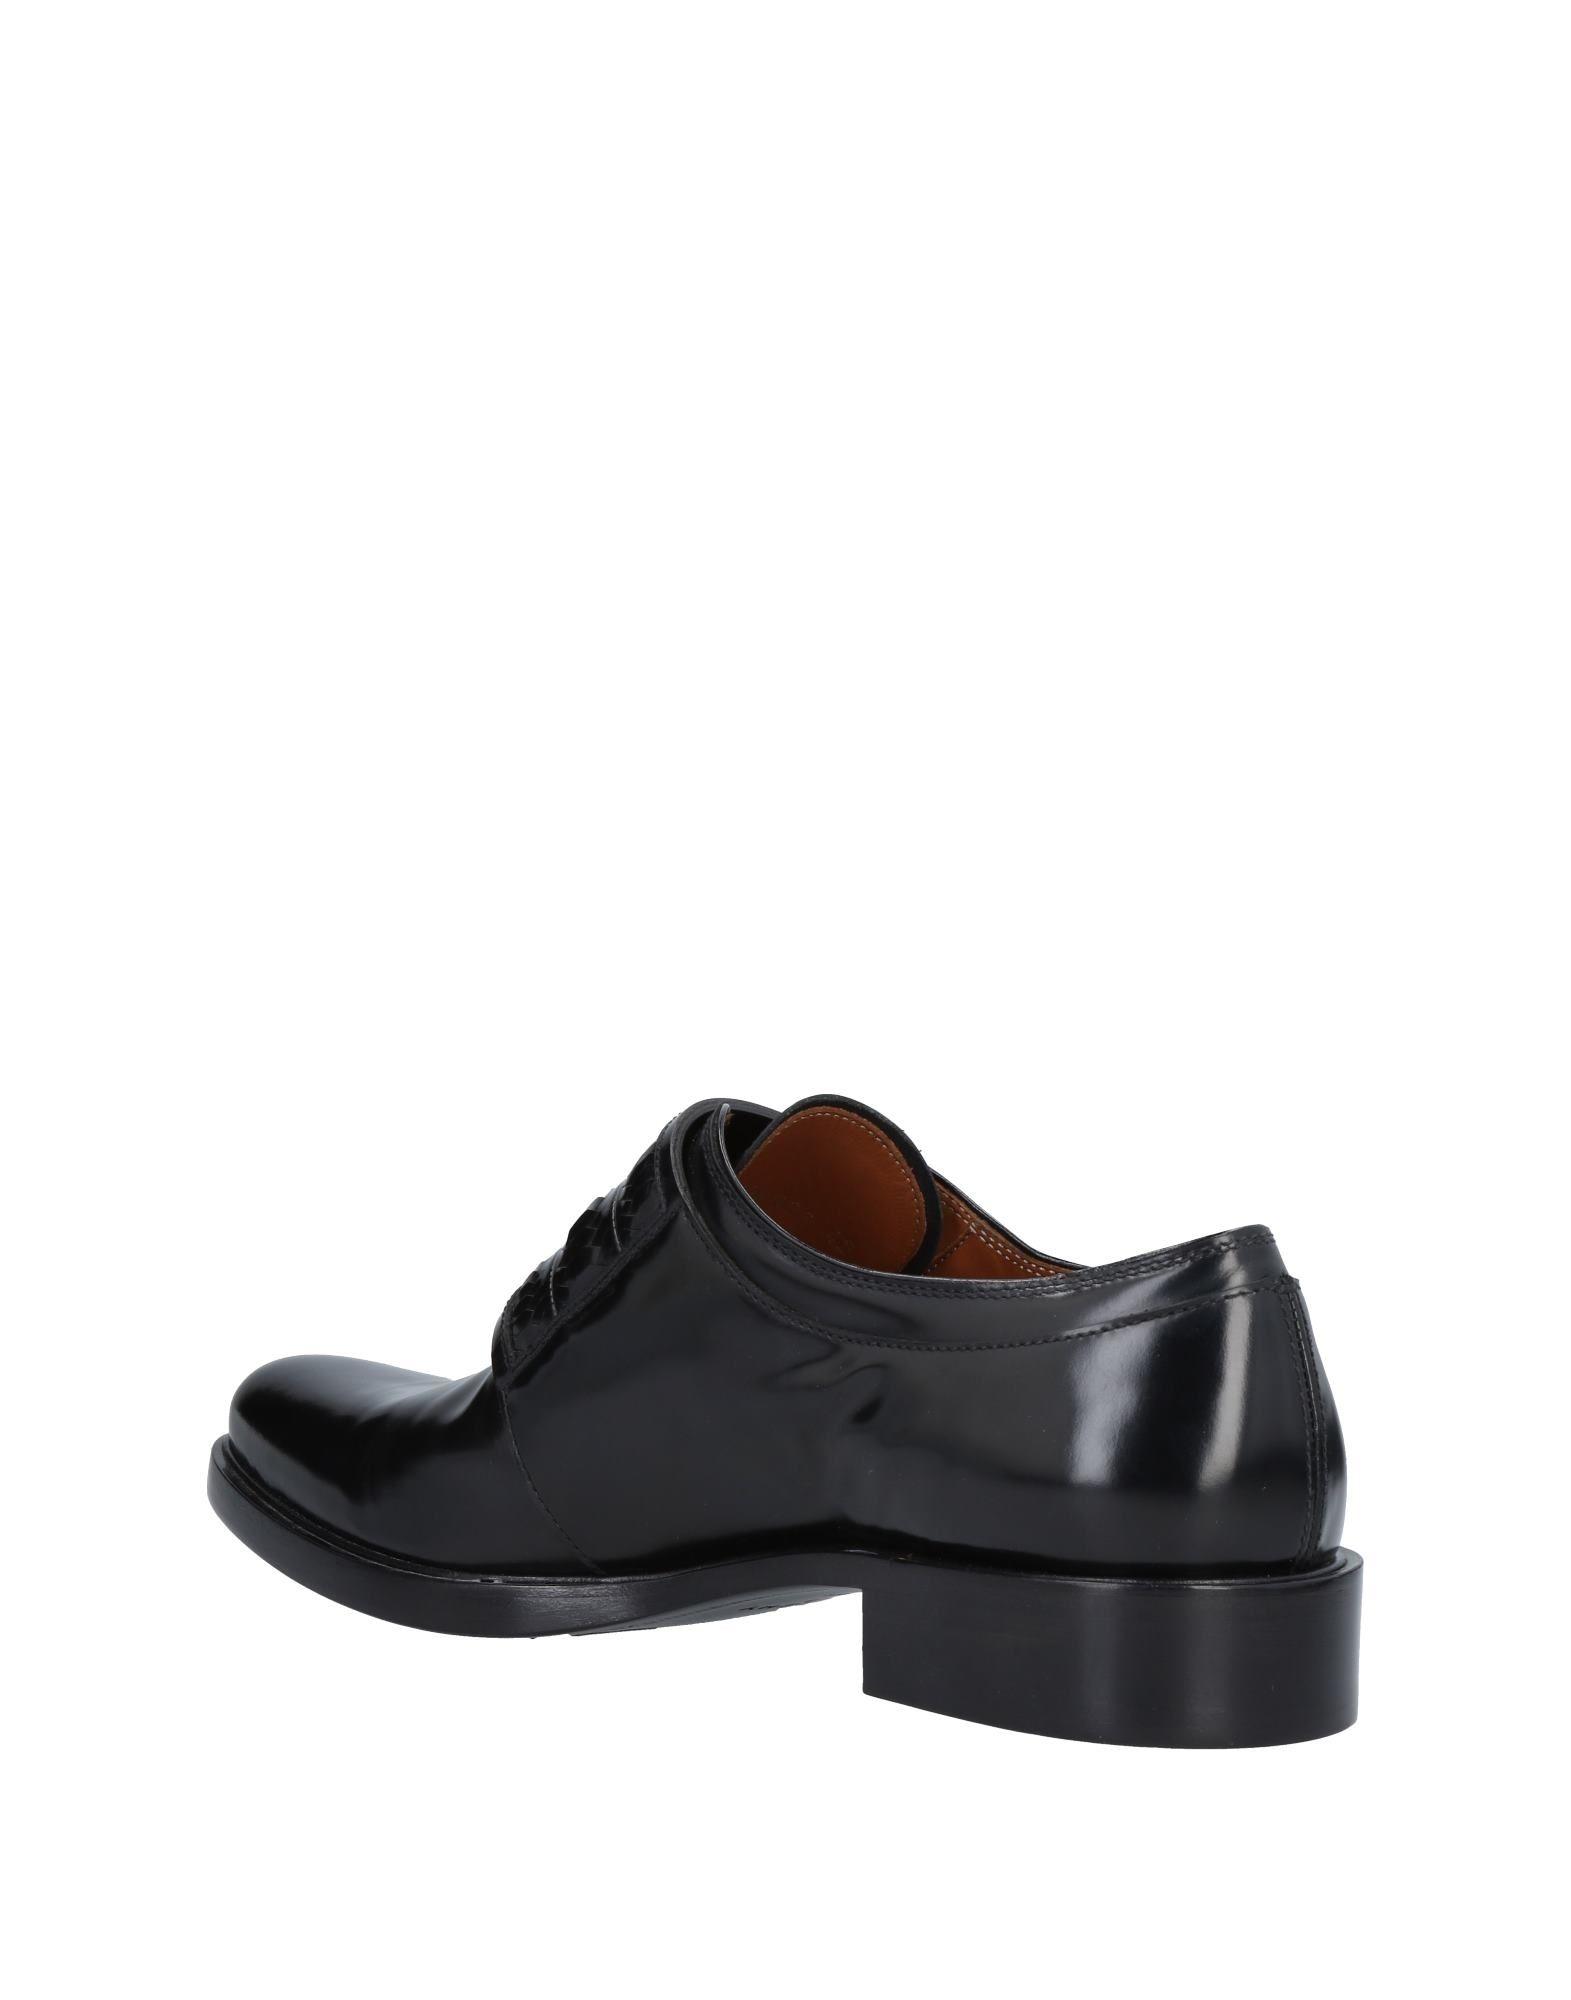 Givenchy Mokassins Herren beliebte  11481118JF Gute Qualität beliebte Herren Schuhe 325e41